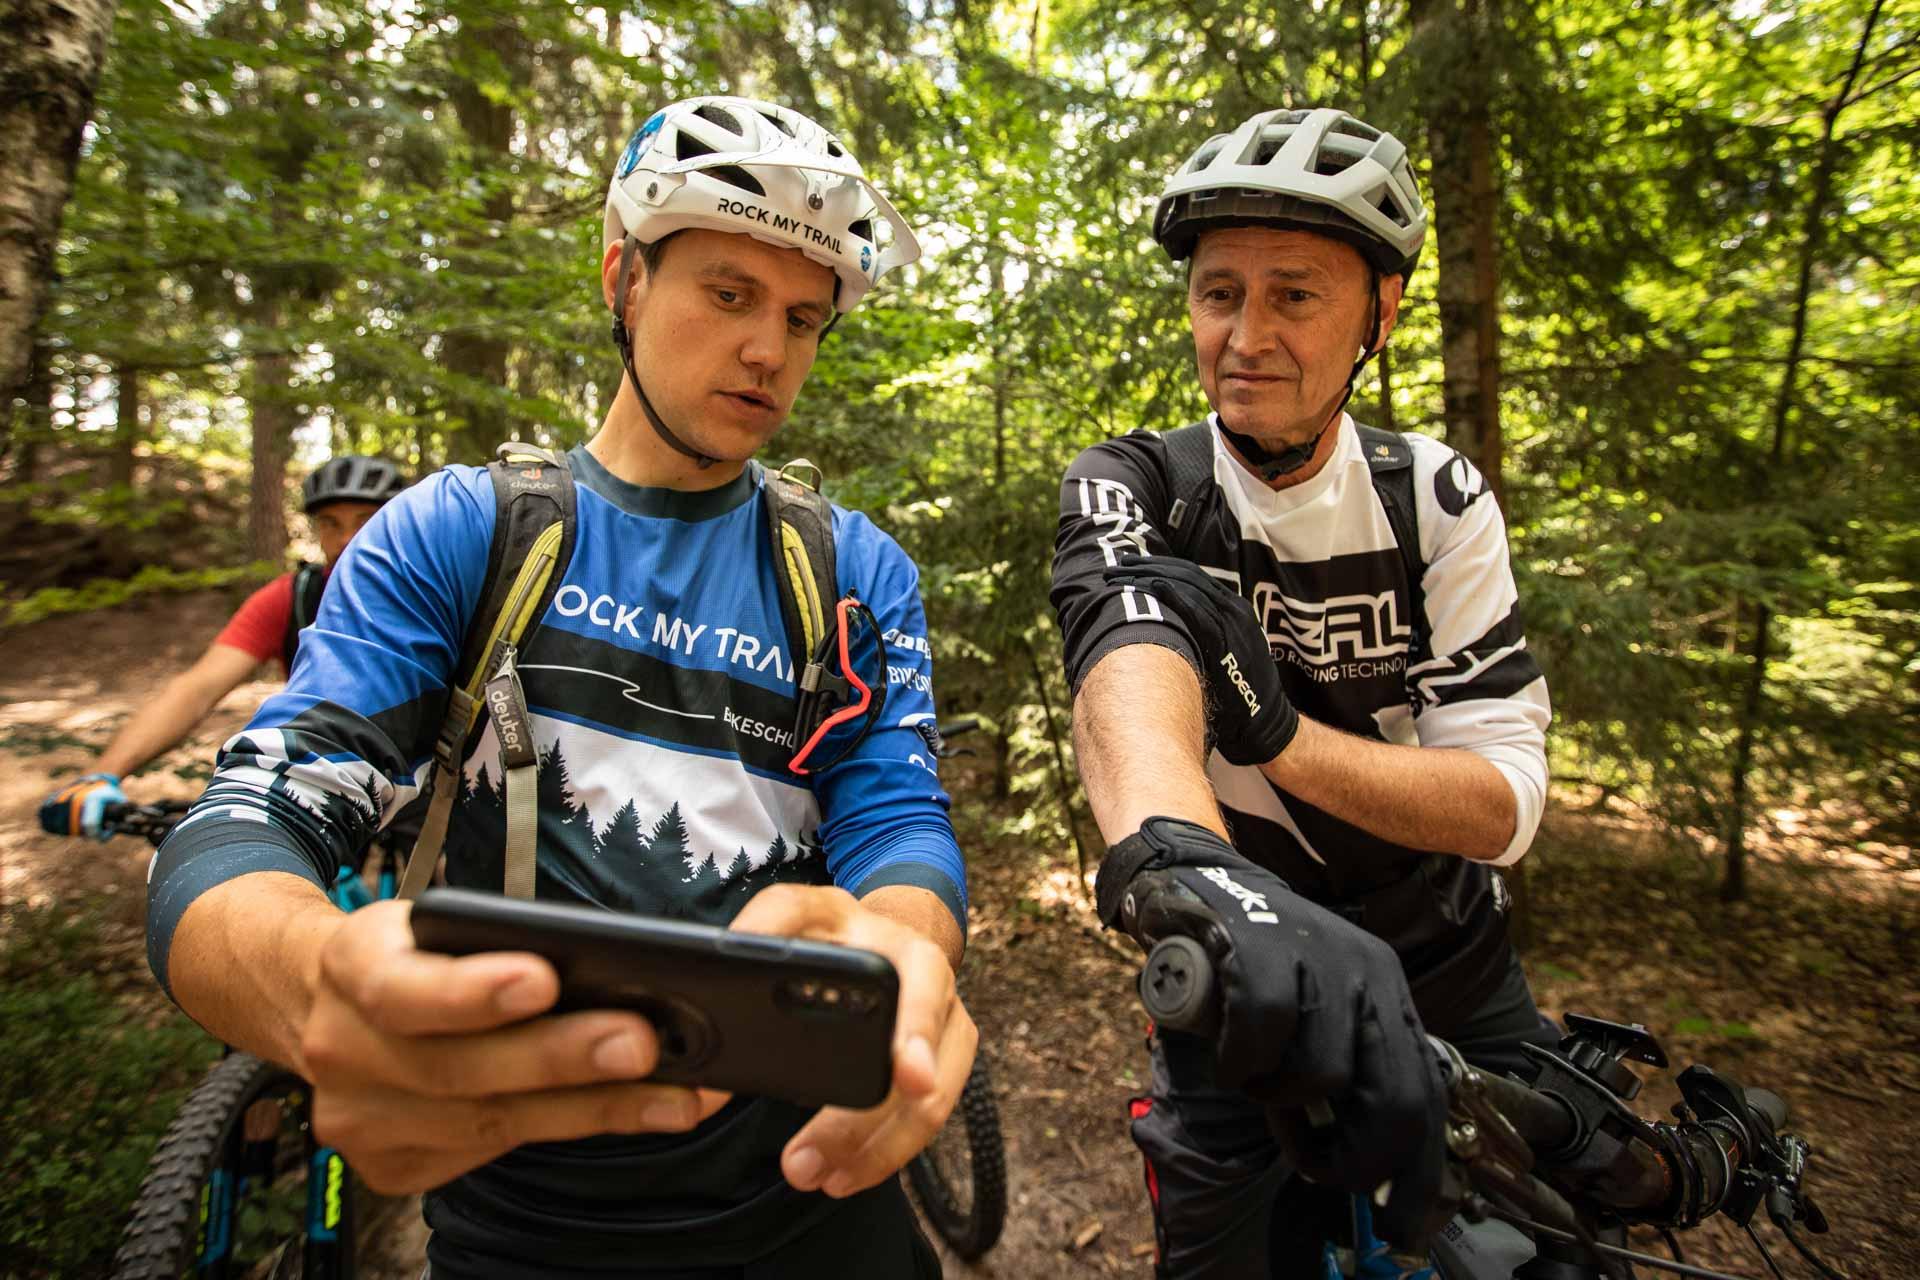 MTB Corona Privat Kurs Fahrtechnik Training Rock my Trail